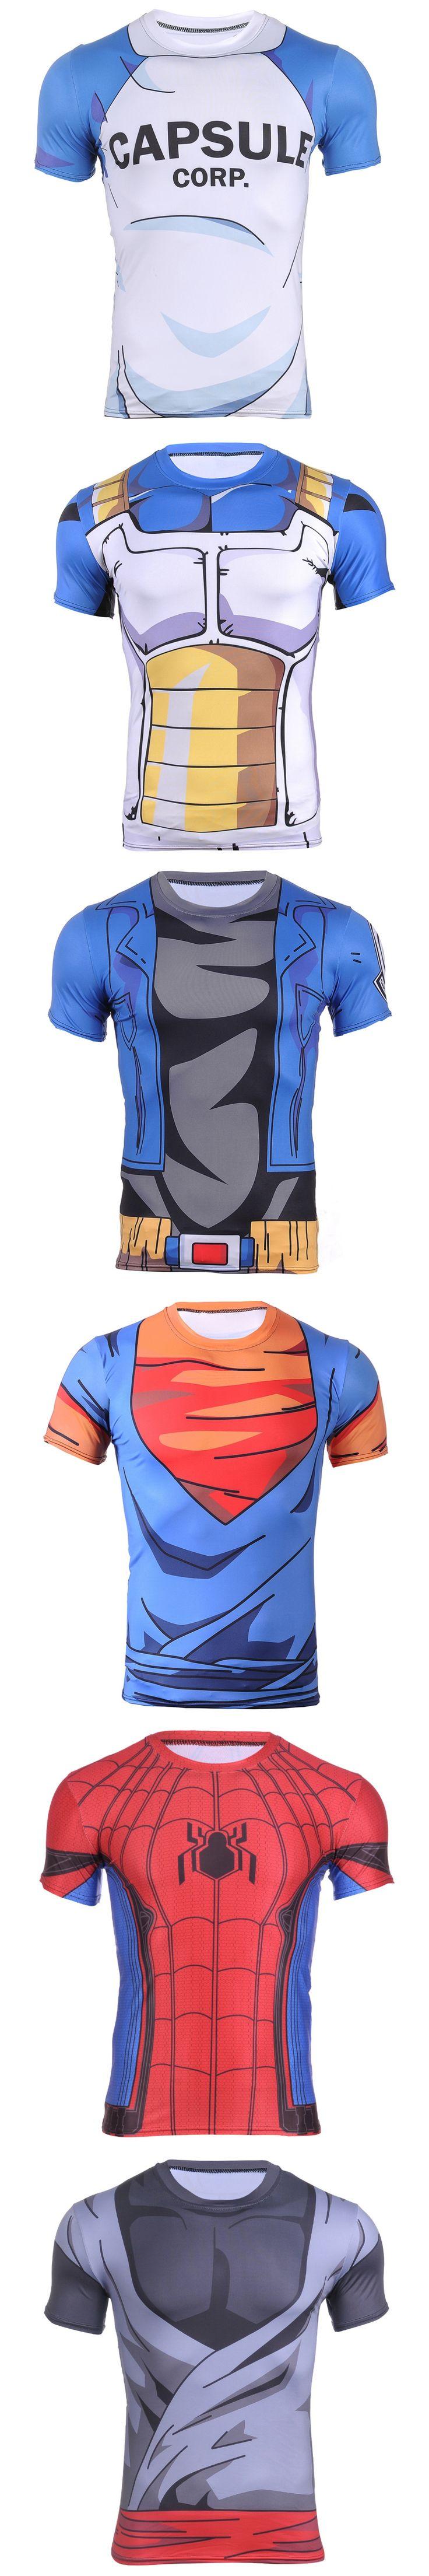 FASHION Sixteen Styles Ball Z Men 3D Dragon Ball Z Goku T-shirt Vegetarian Various Colors Jersey Plus Size Men's Muscle clothing